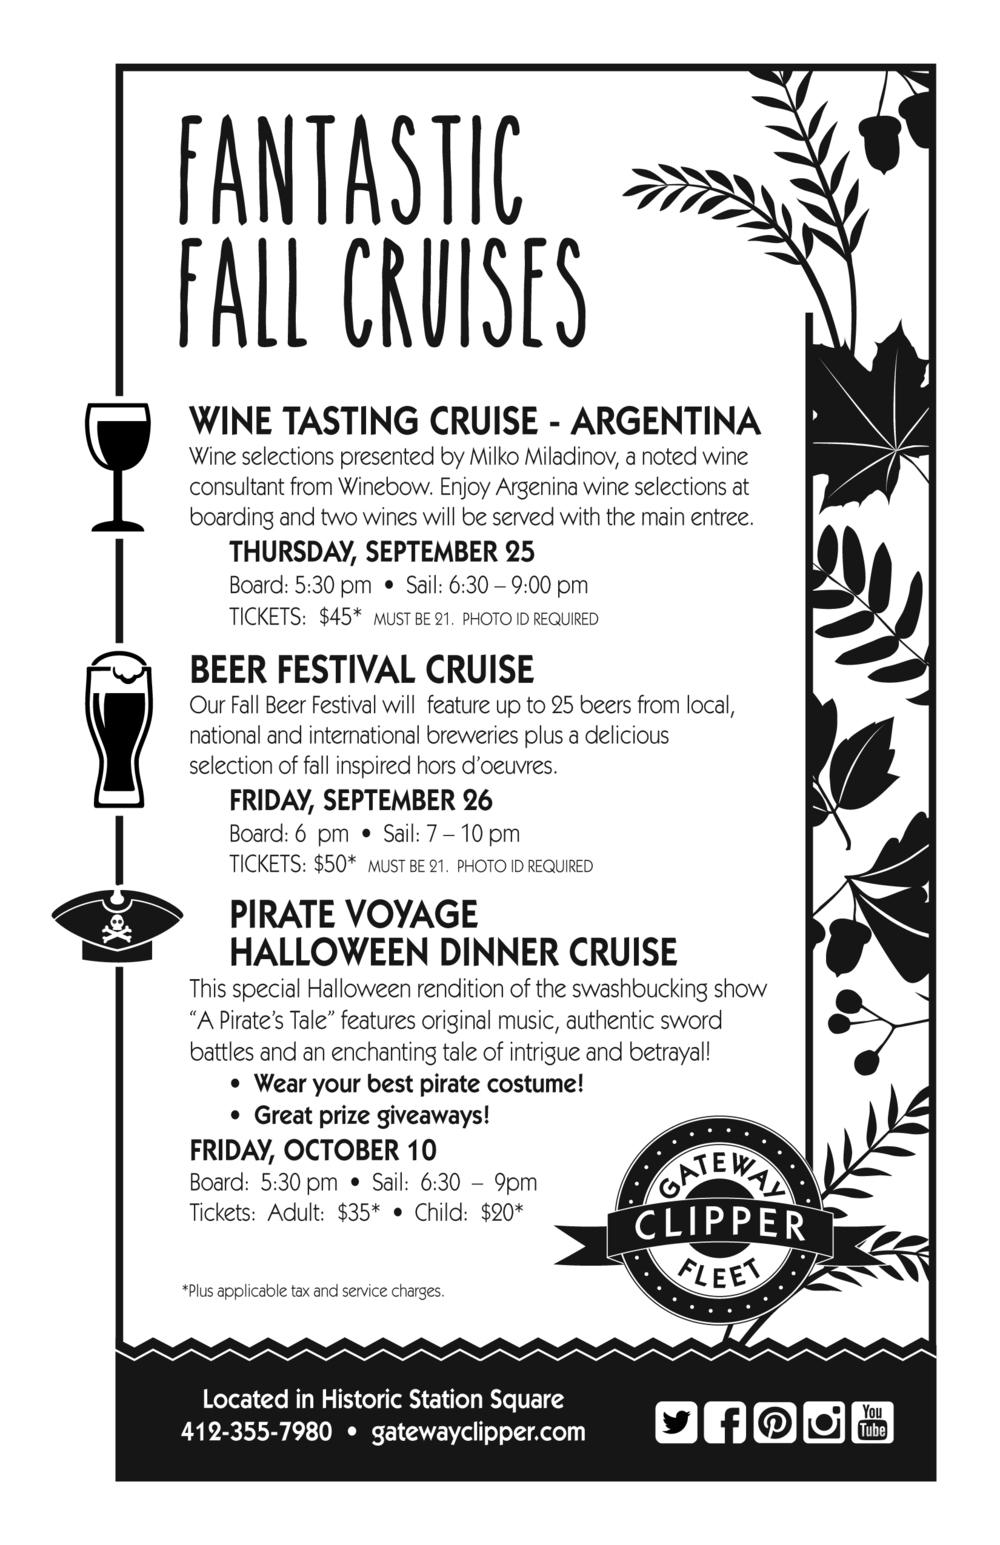 Flyer highlighting Fantastic Fall Cruises